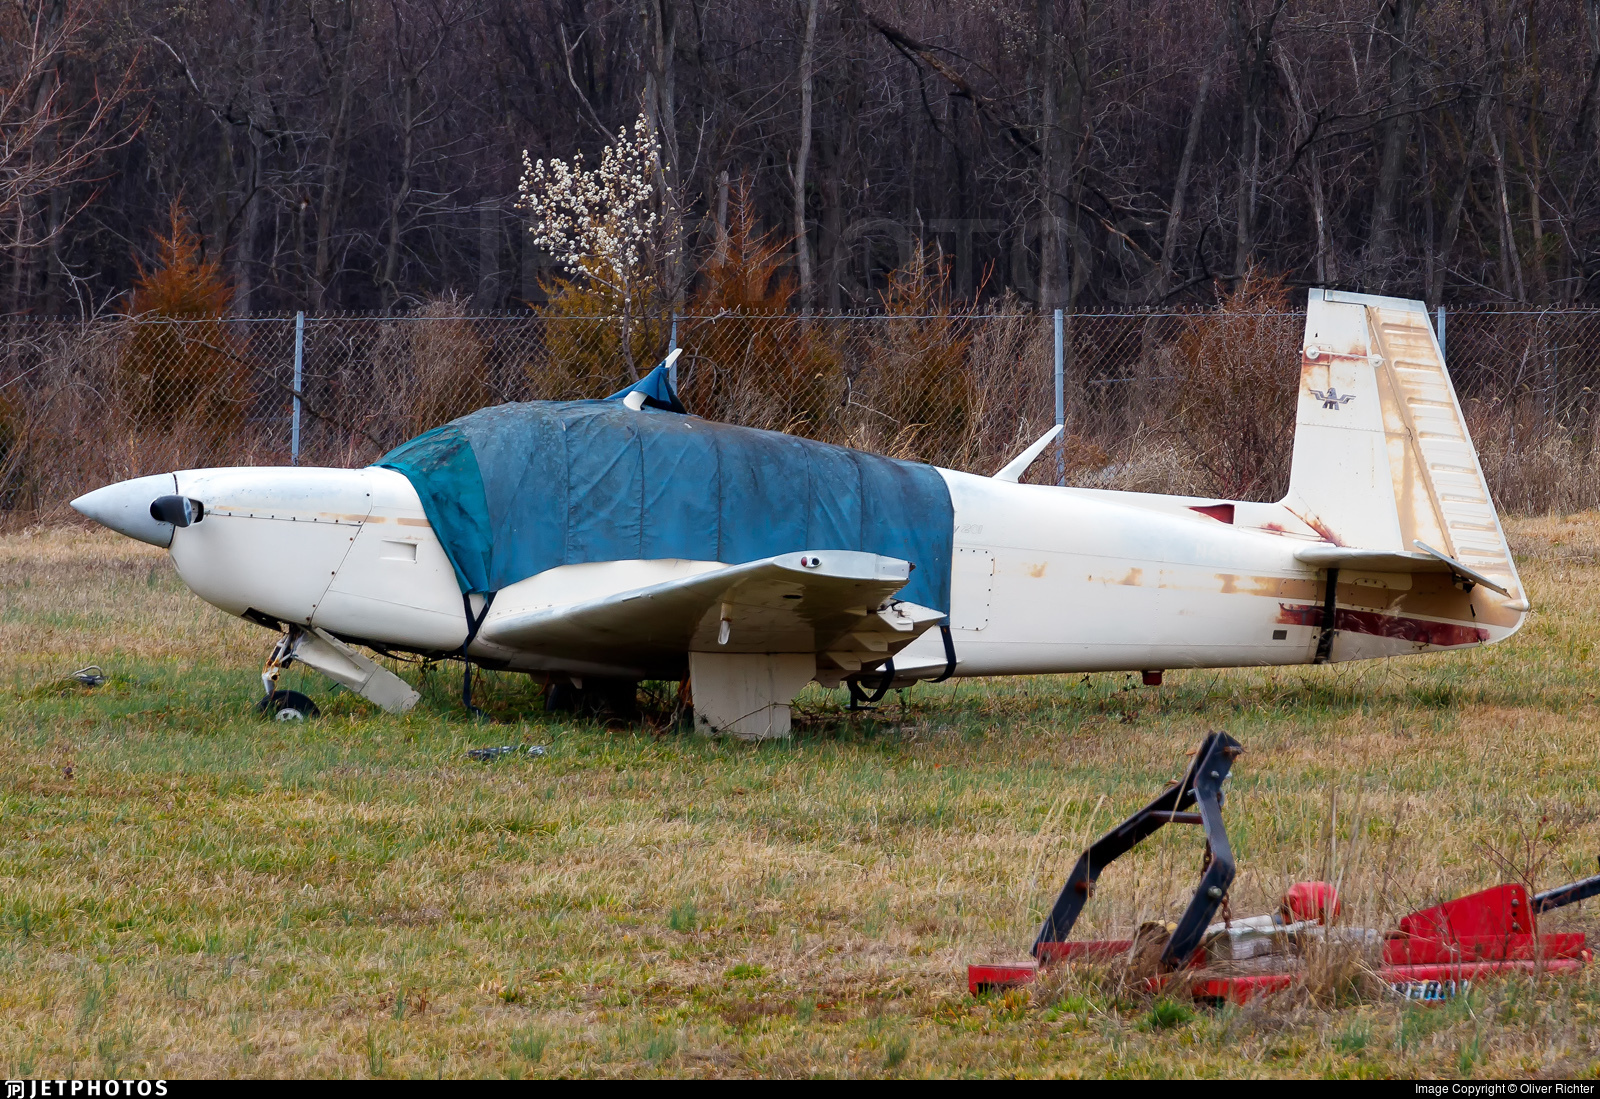 N4598H - Mooney M20J-201 - Private